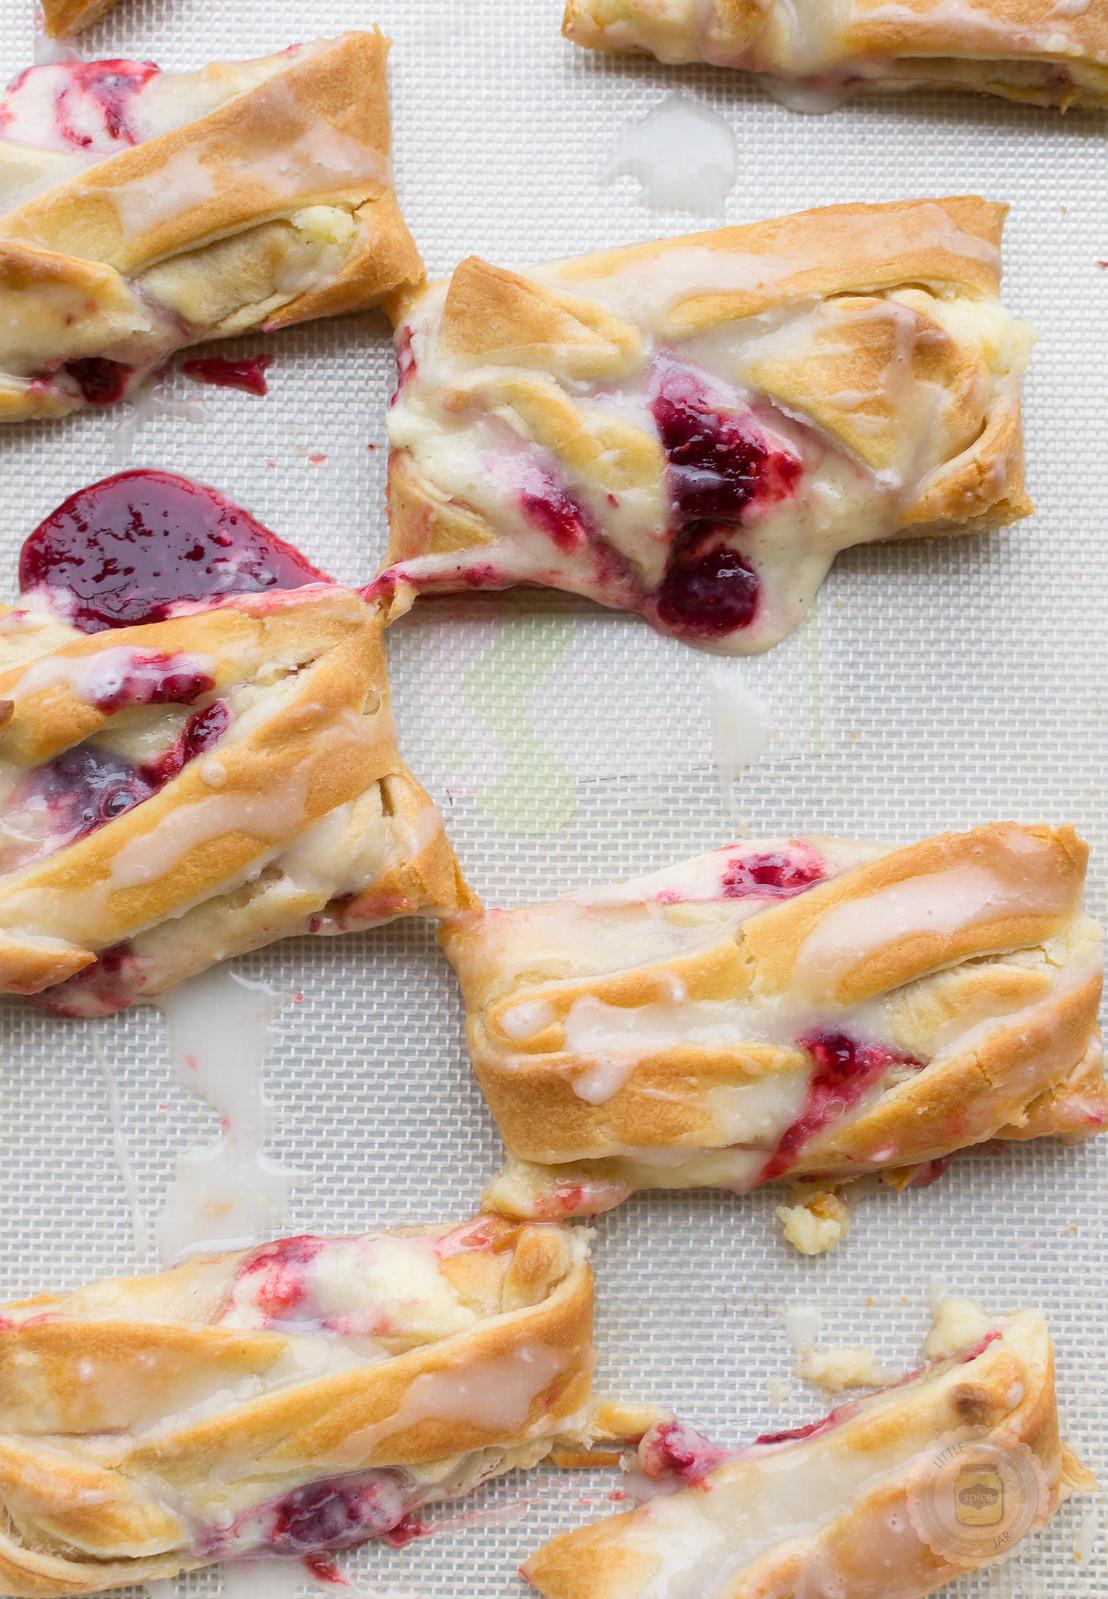 raspberry cream cheese danish braid cut into pieces on baking mat oozing raspberry juices